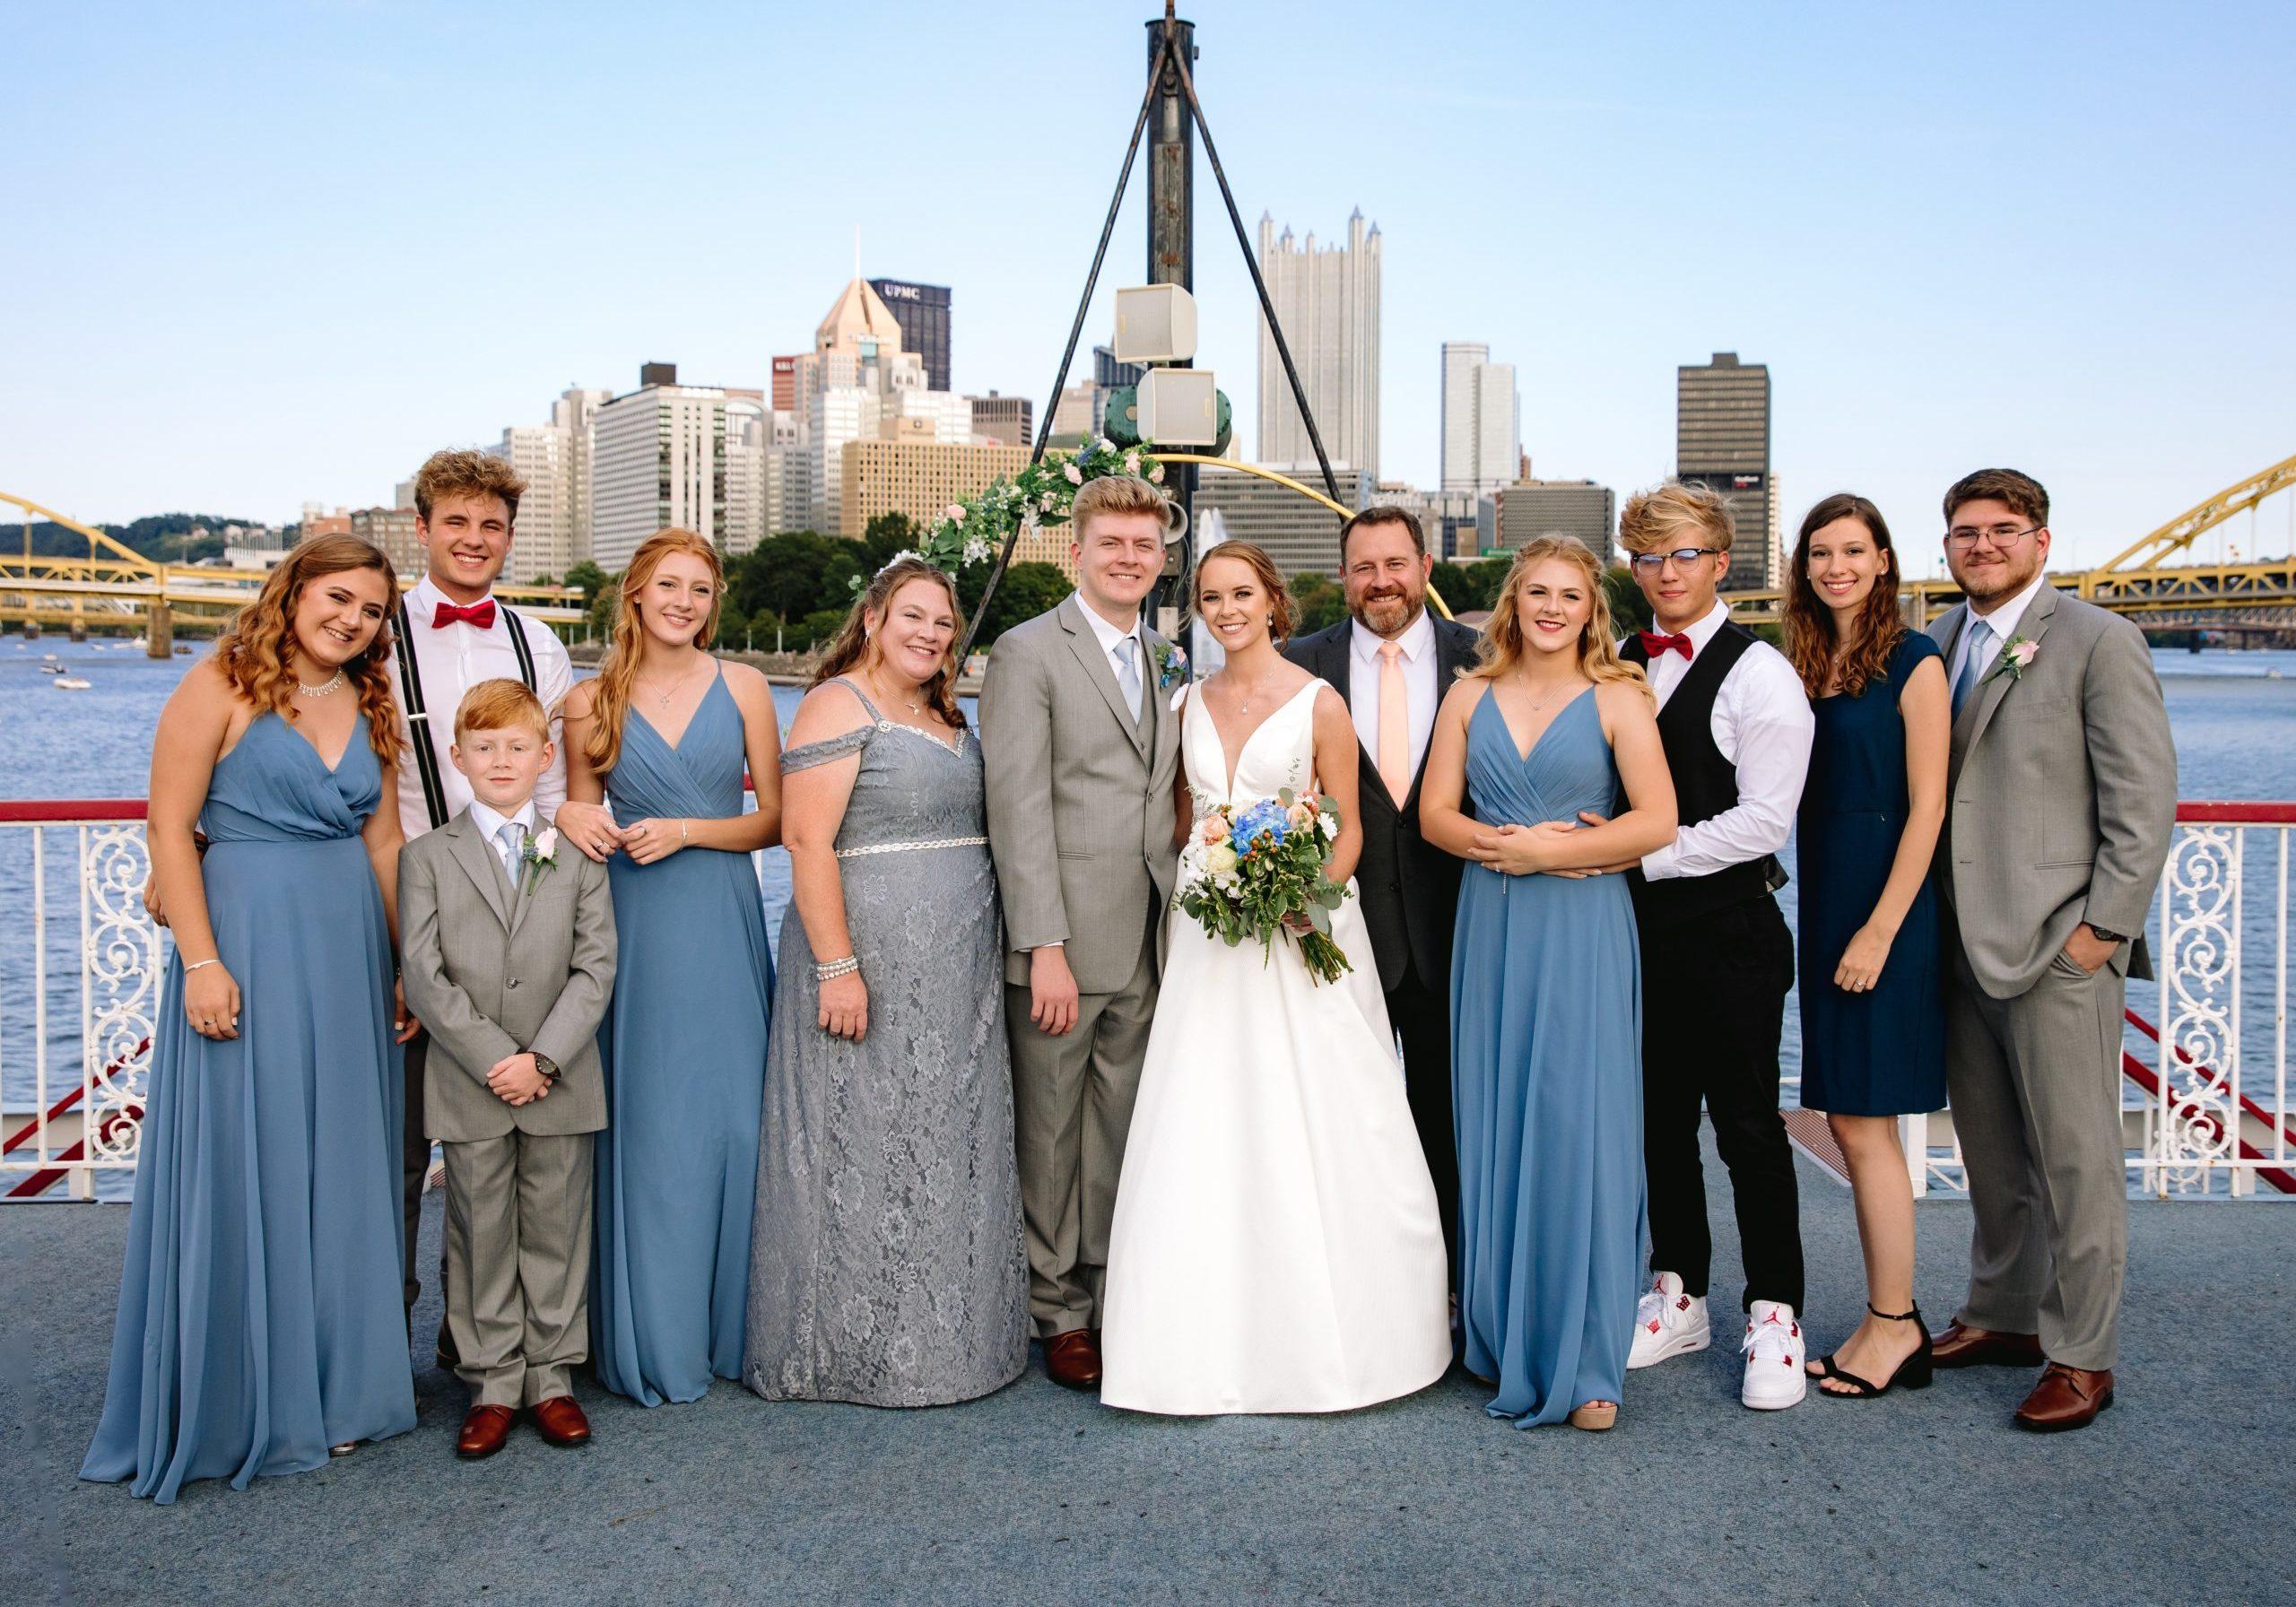 Cody & family wedding pic